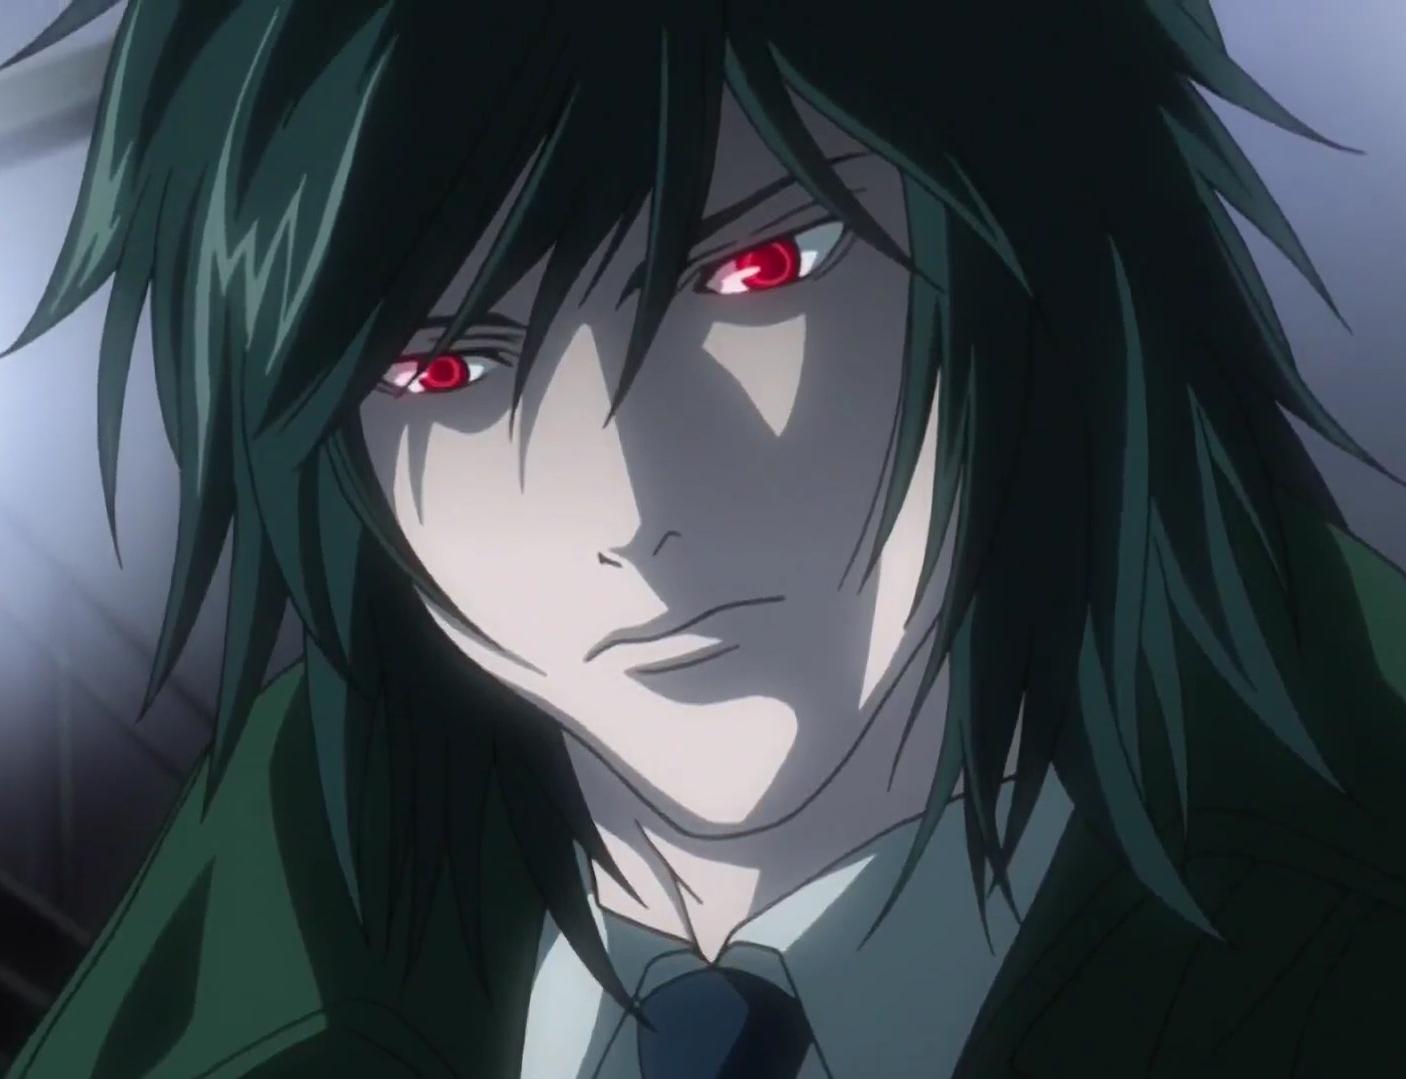 Plik:Mikami's Shinigami Eyes.png